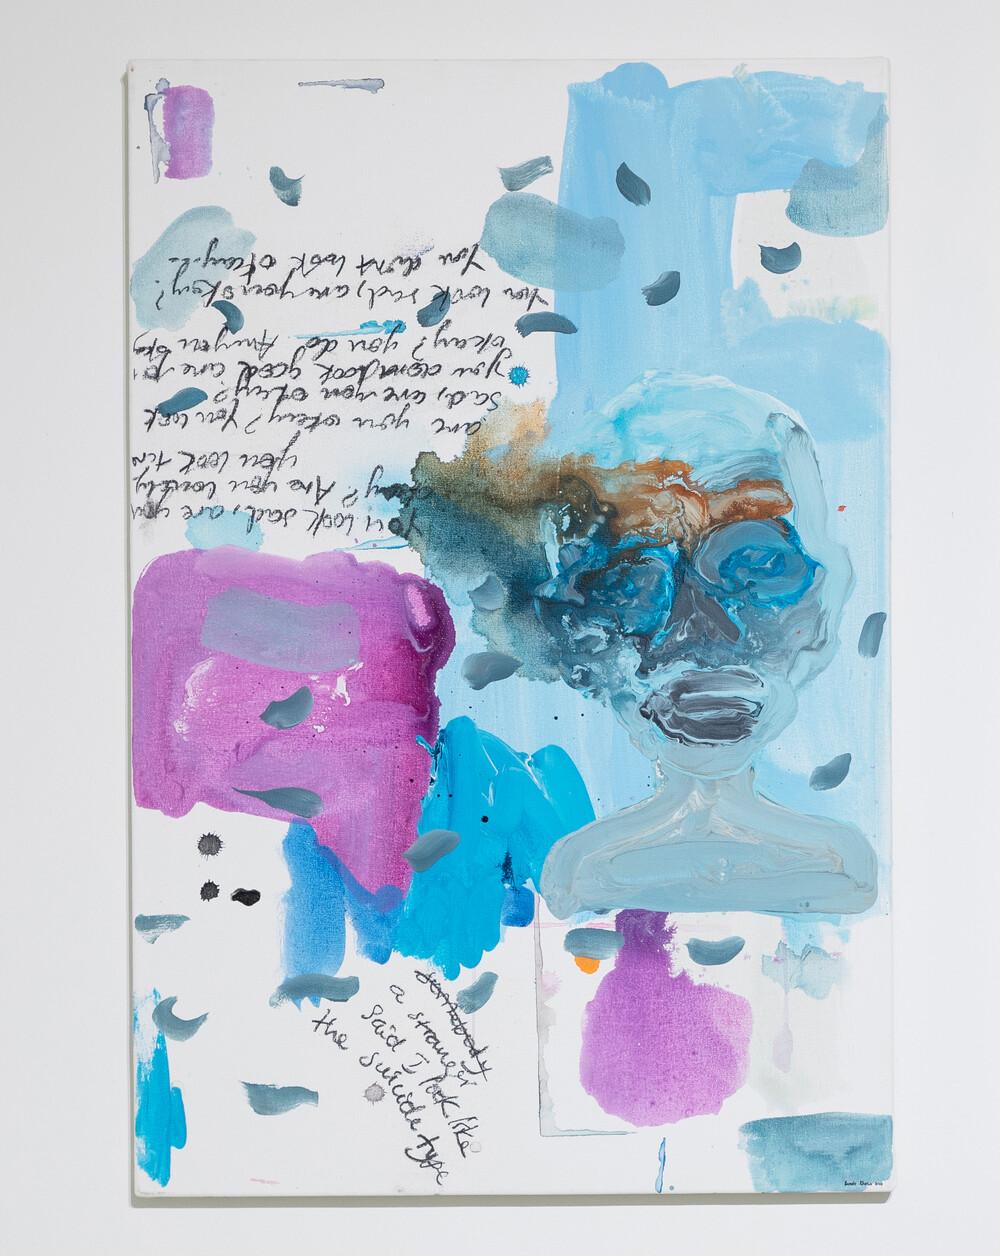 Banele Khoza - © Galerie des Galeries